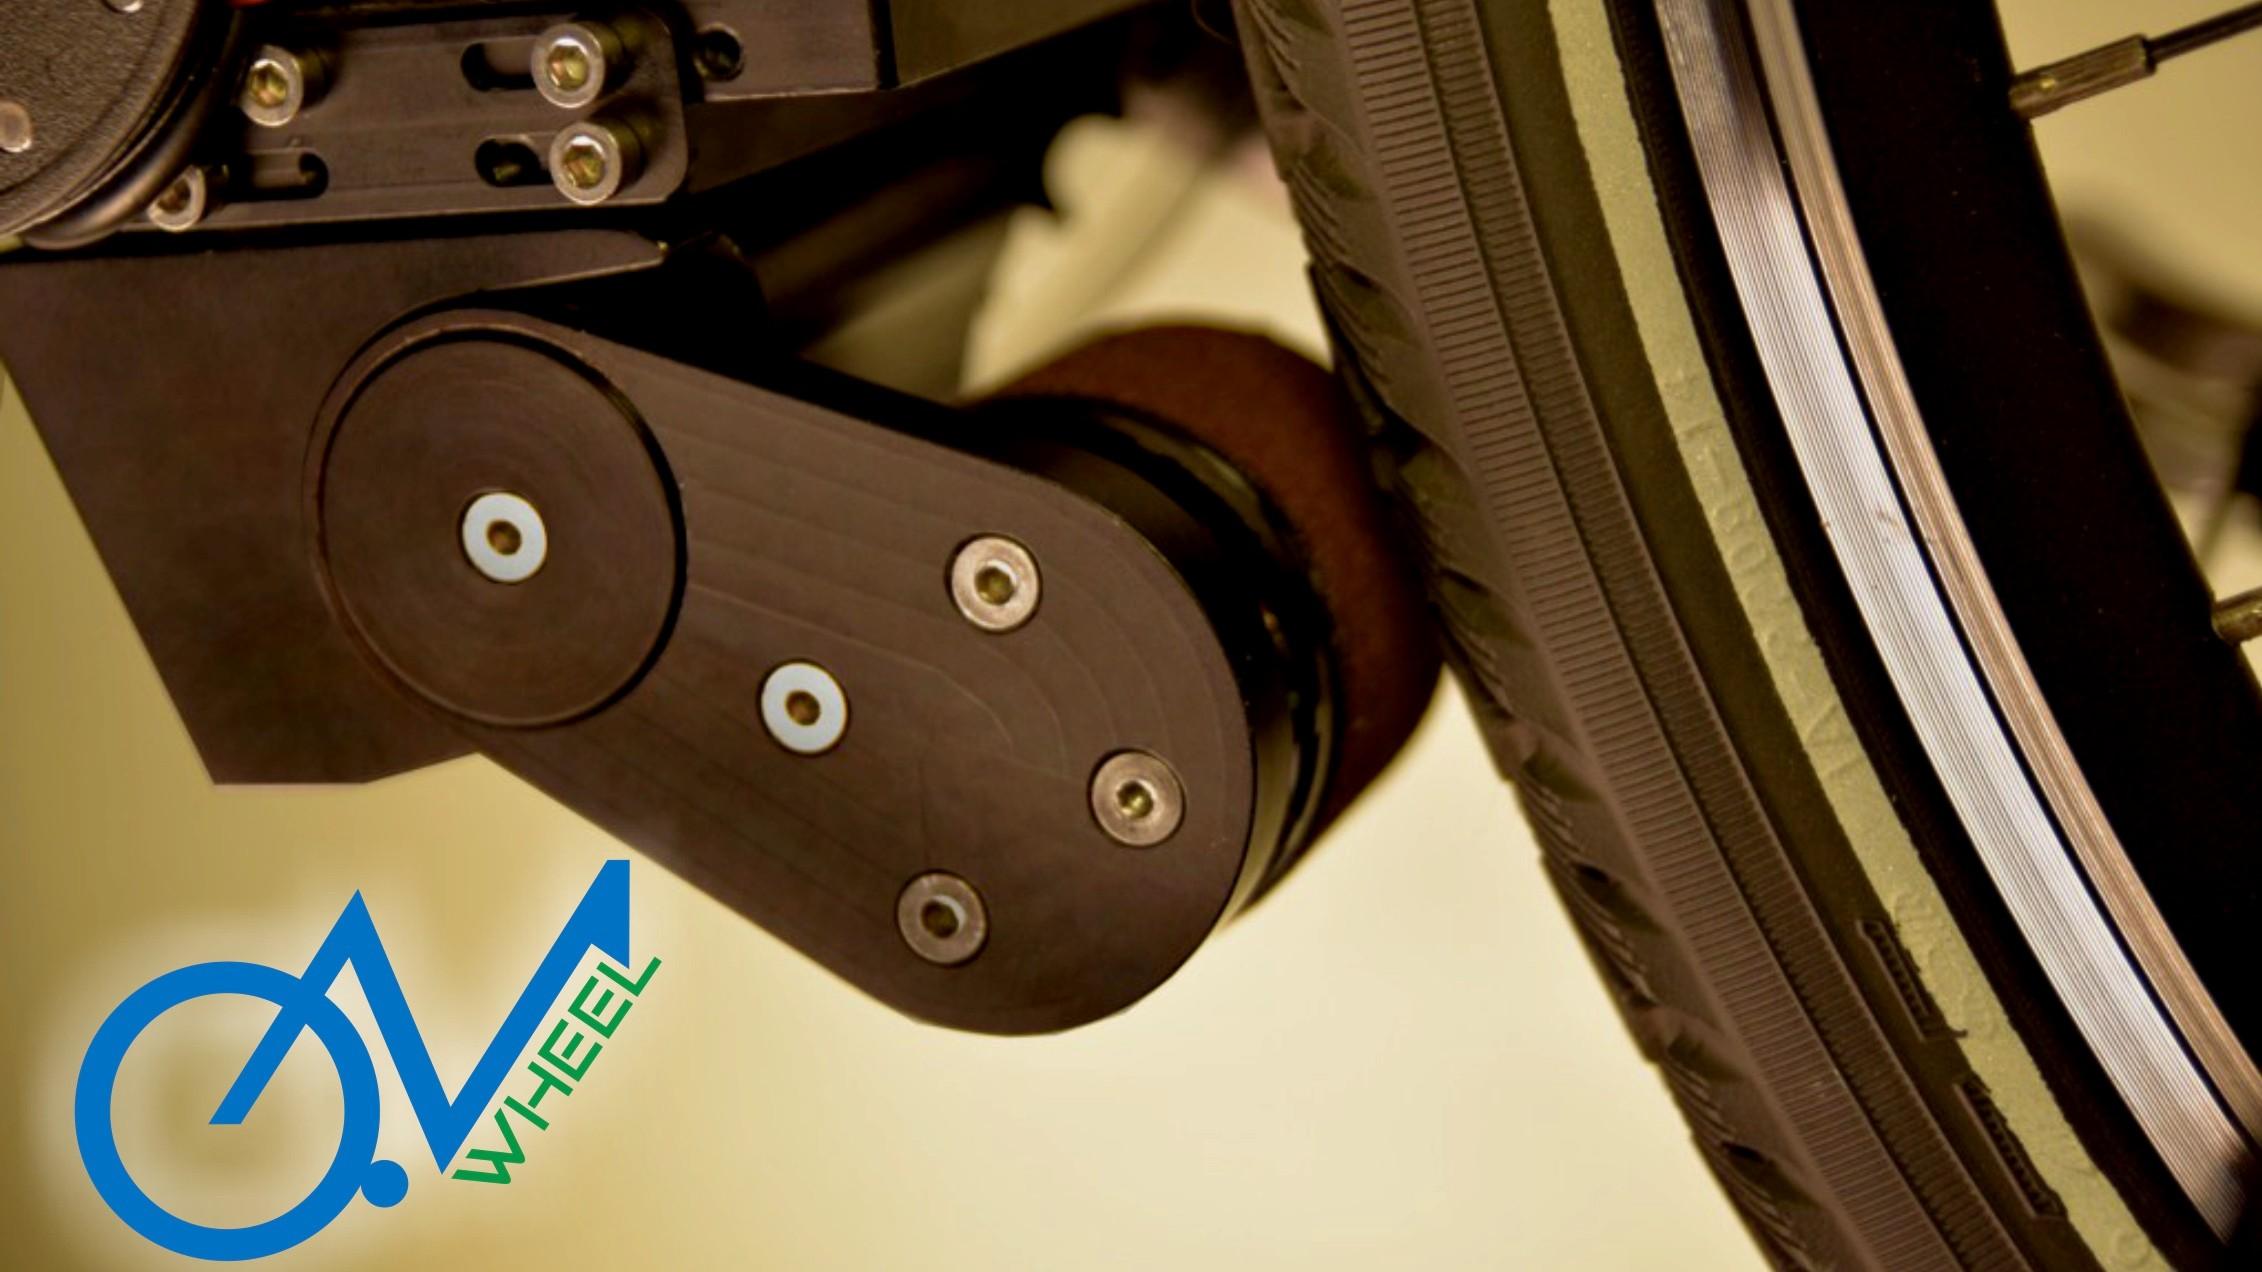 The go-e ONwheel powers your rear wheel via friction from underneath